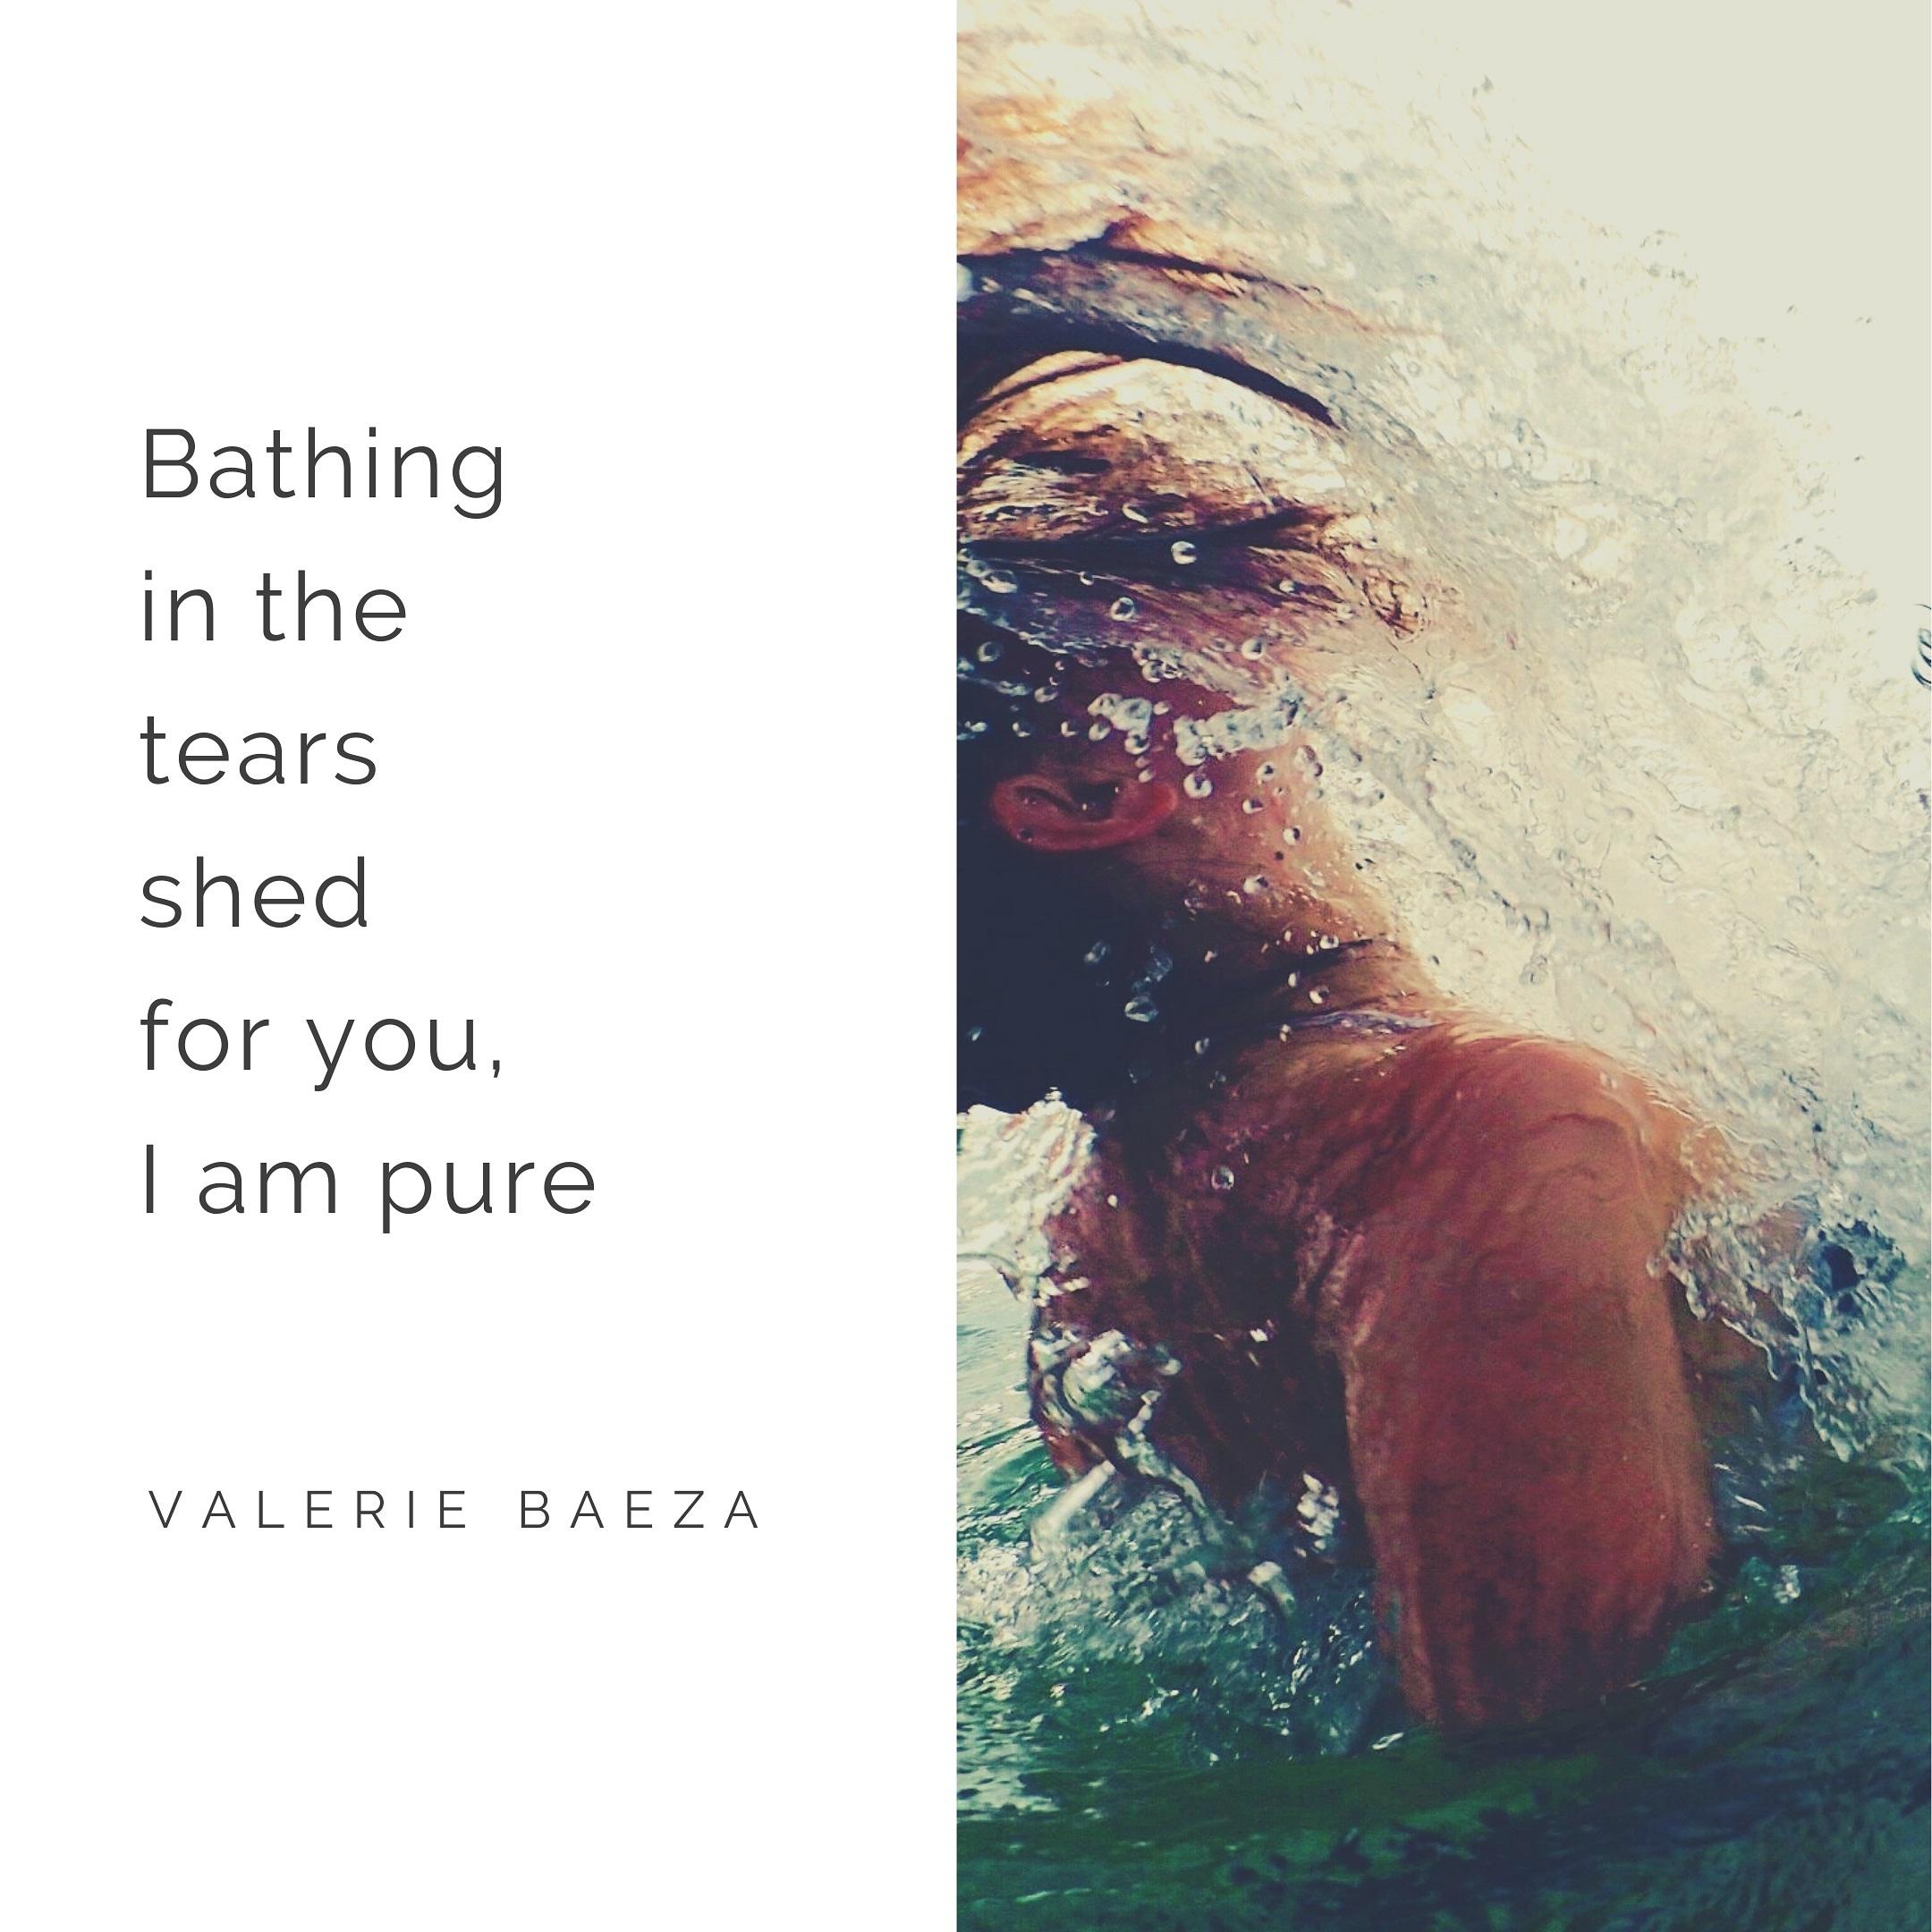 Bathing Tears by Valerie Baeza